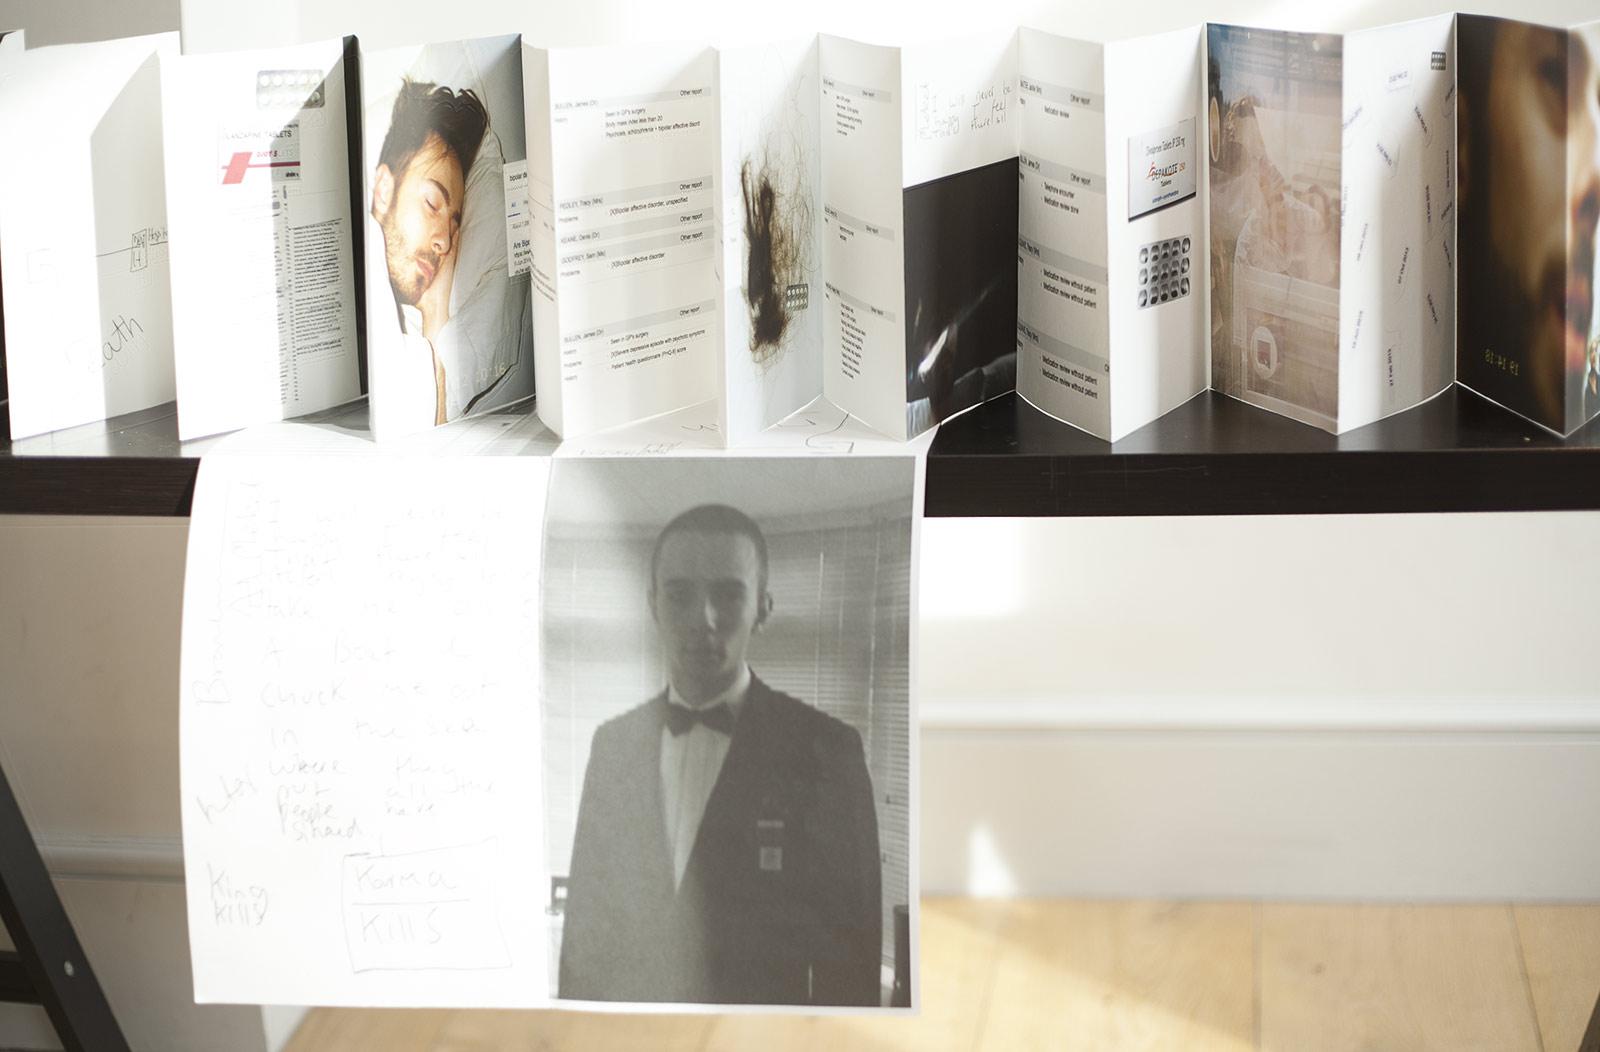 photobook-pop-up3-3headsin1